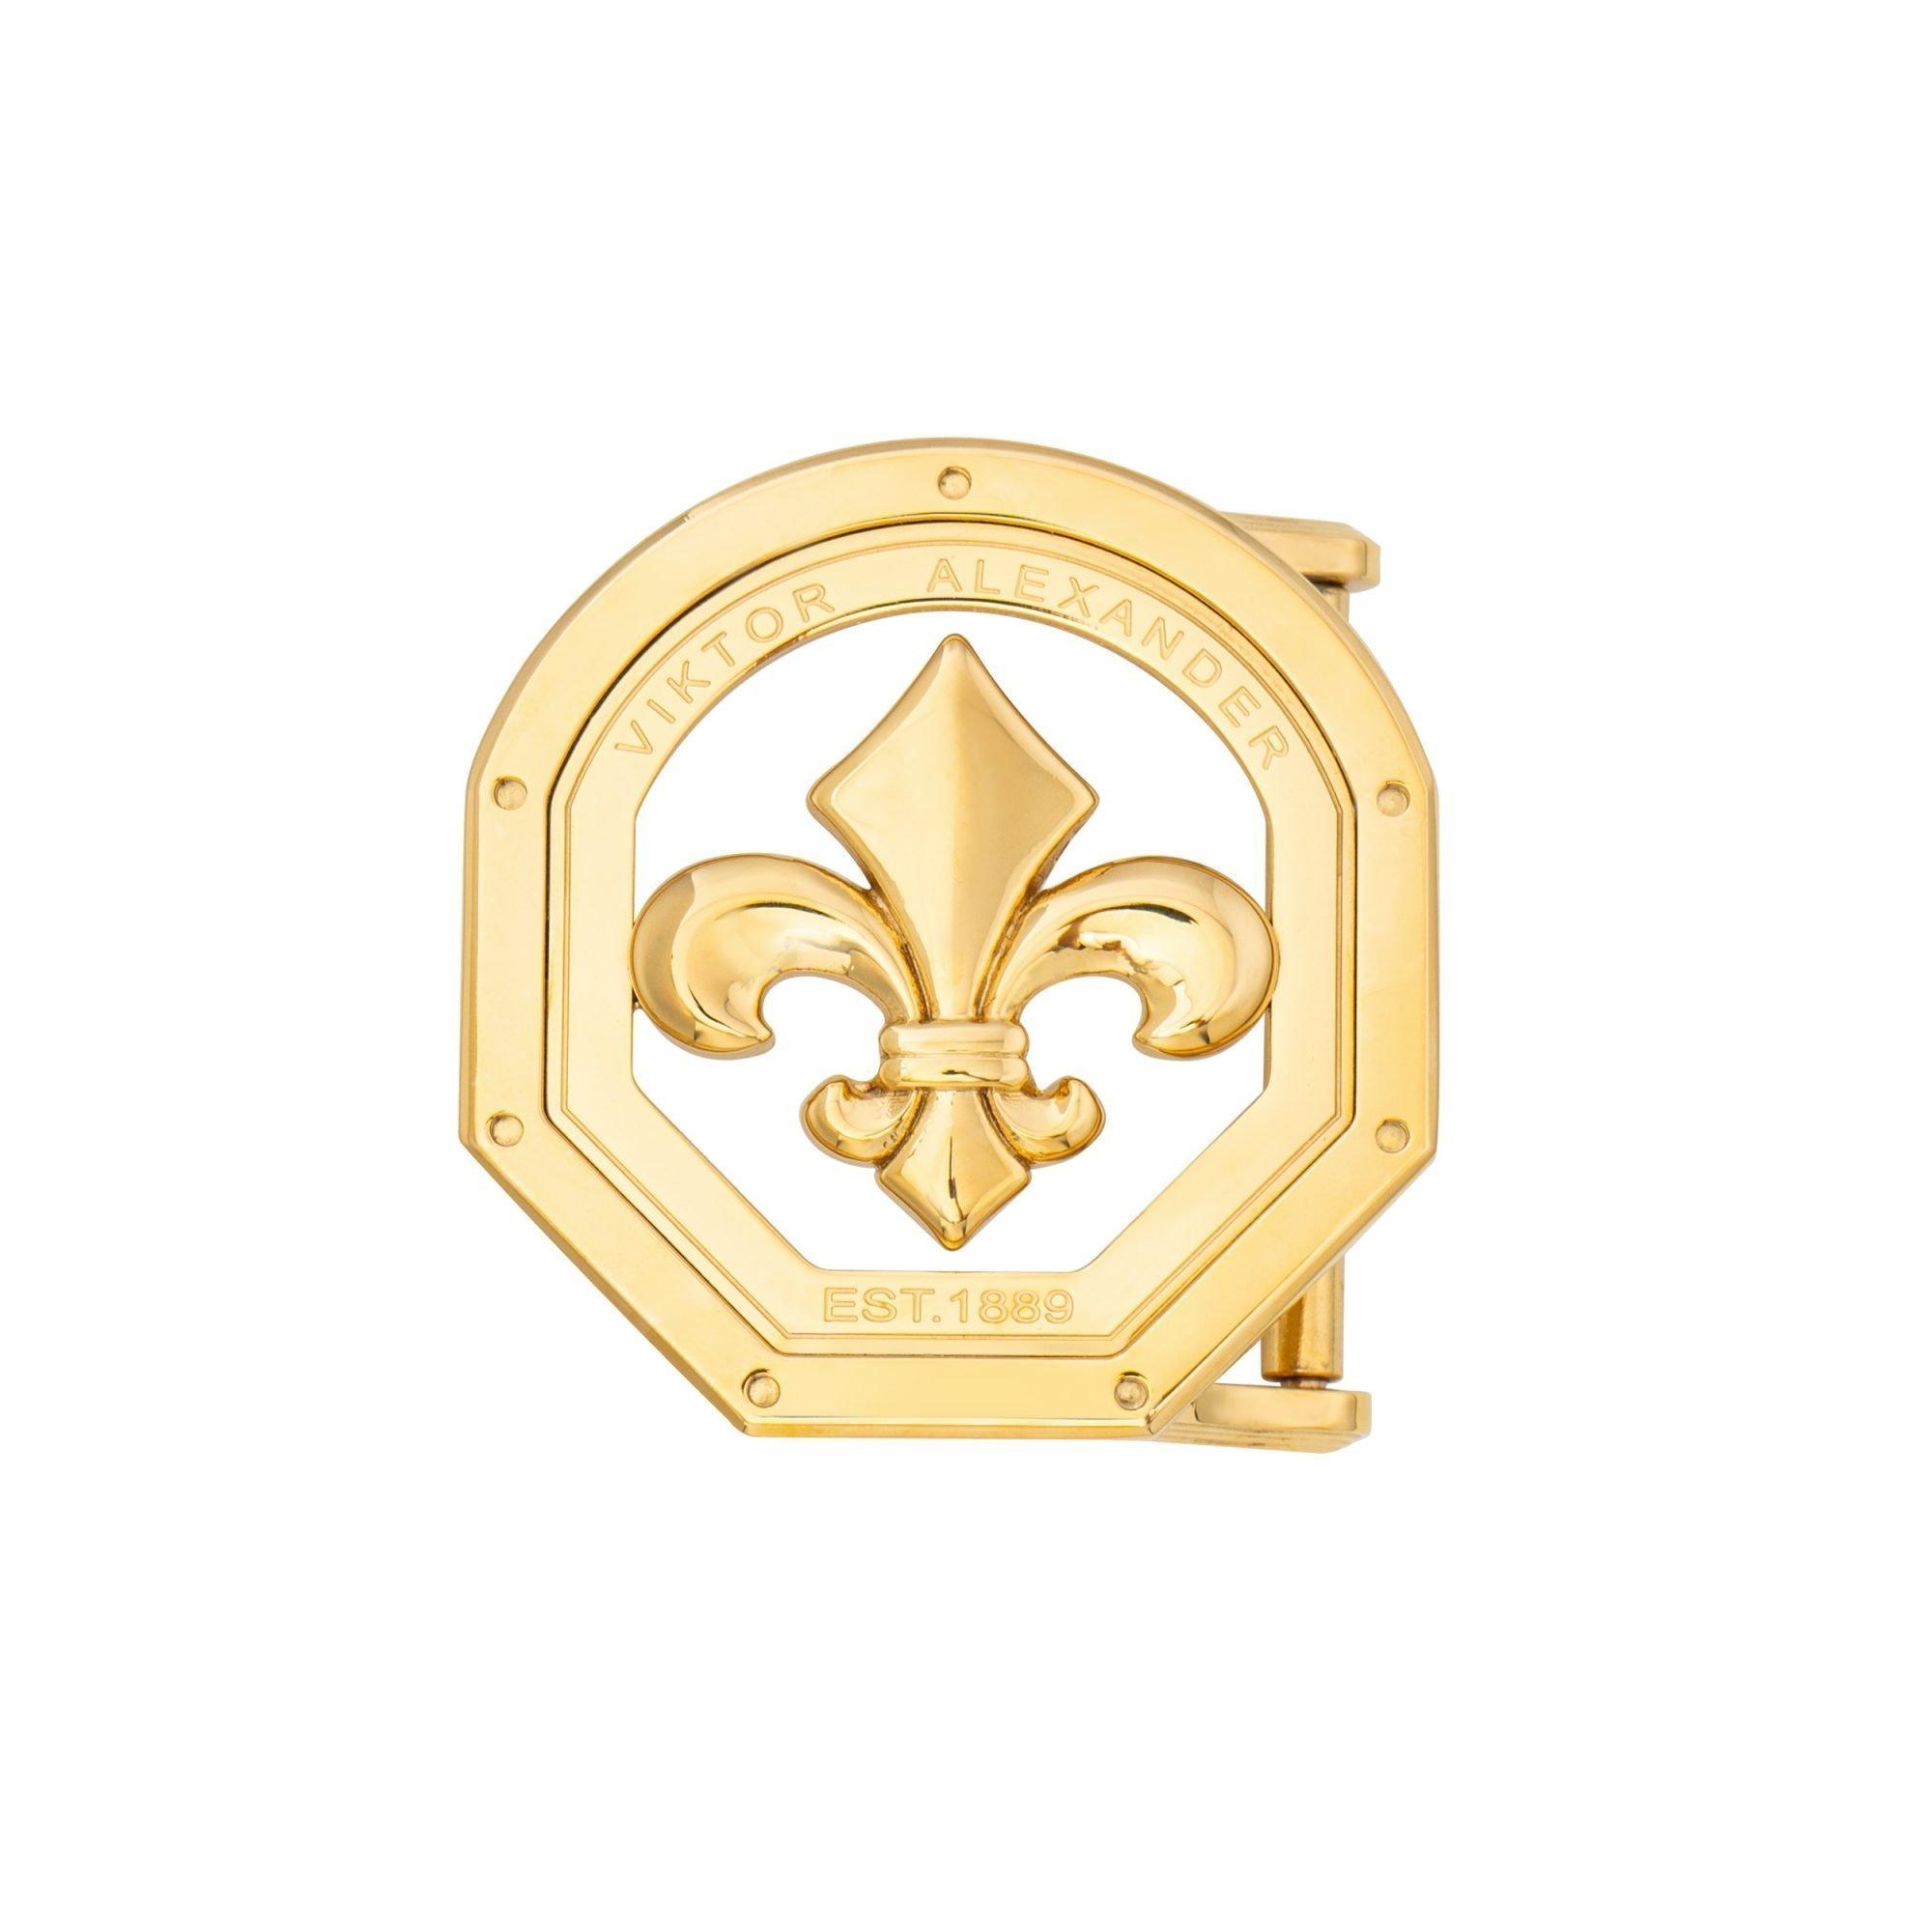 VIKTOR ALEXANDER 38MM STAINLESS STEEL BELT BUCKLE FLEUR DE LIS OFF-SHAPE YELLOW GOLD FRONT PROFILE